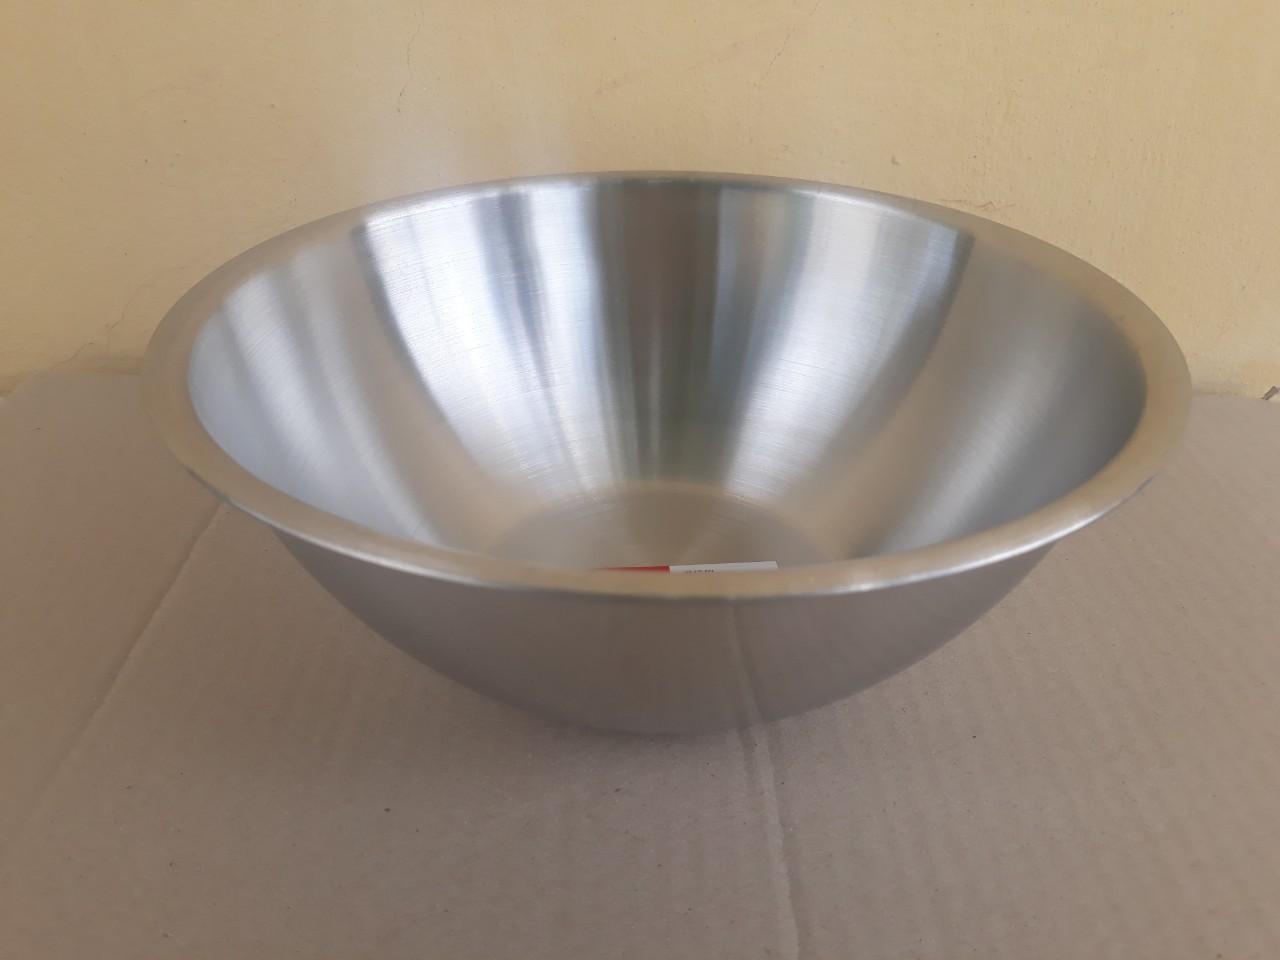 Tô tròn inox 24cm 100235024